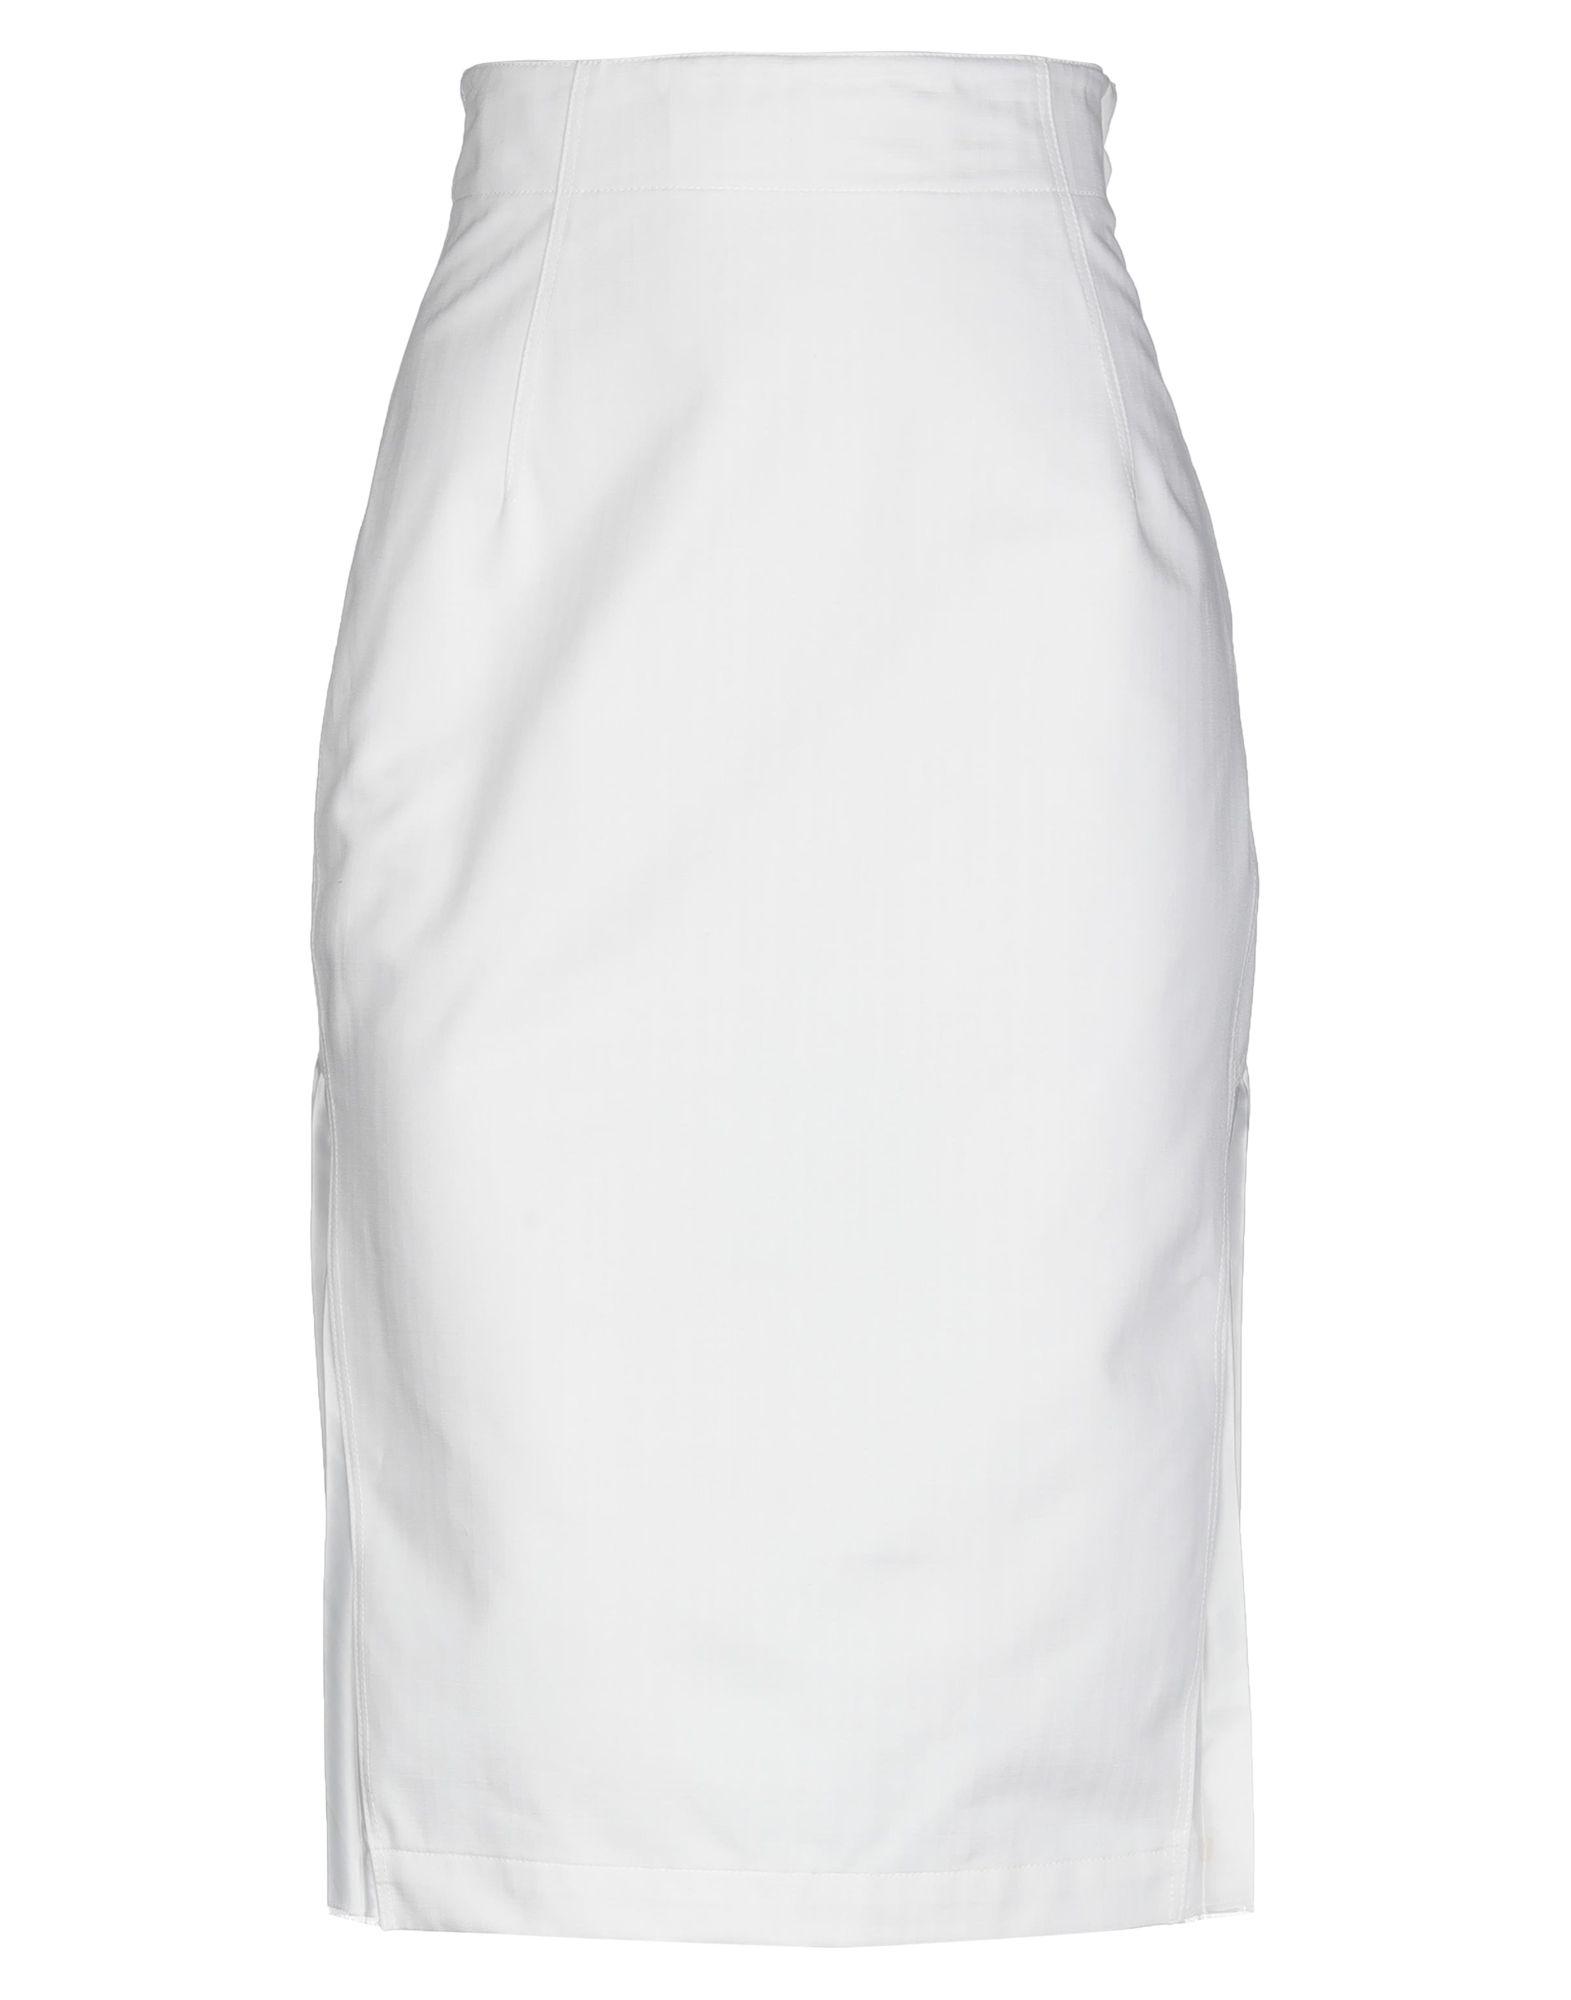 LTD FORNARINA Юбка длиной 3/4 брюки fornarina